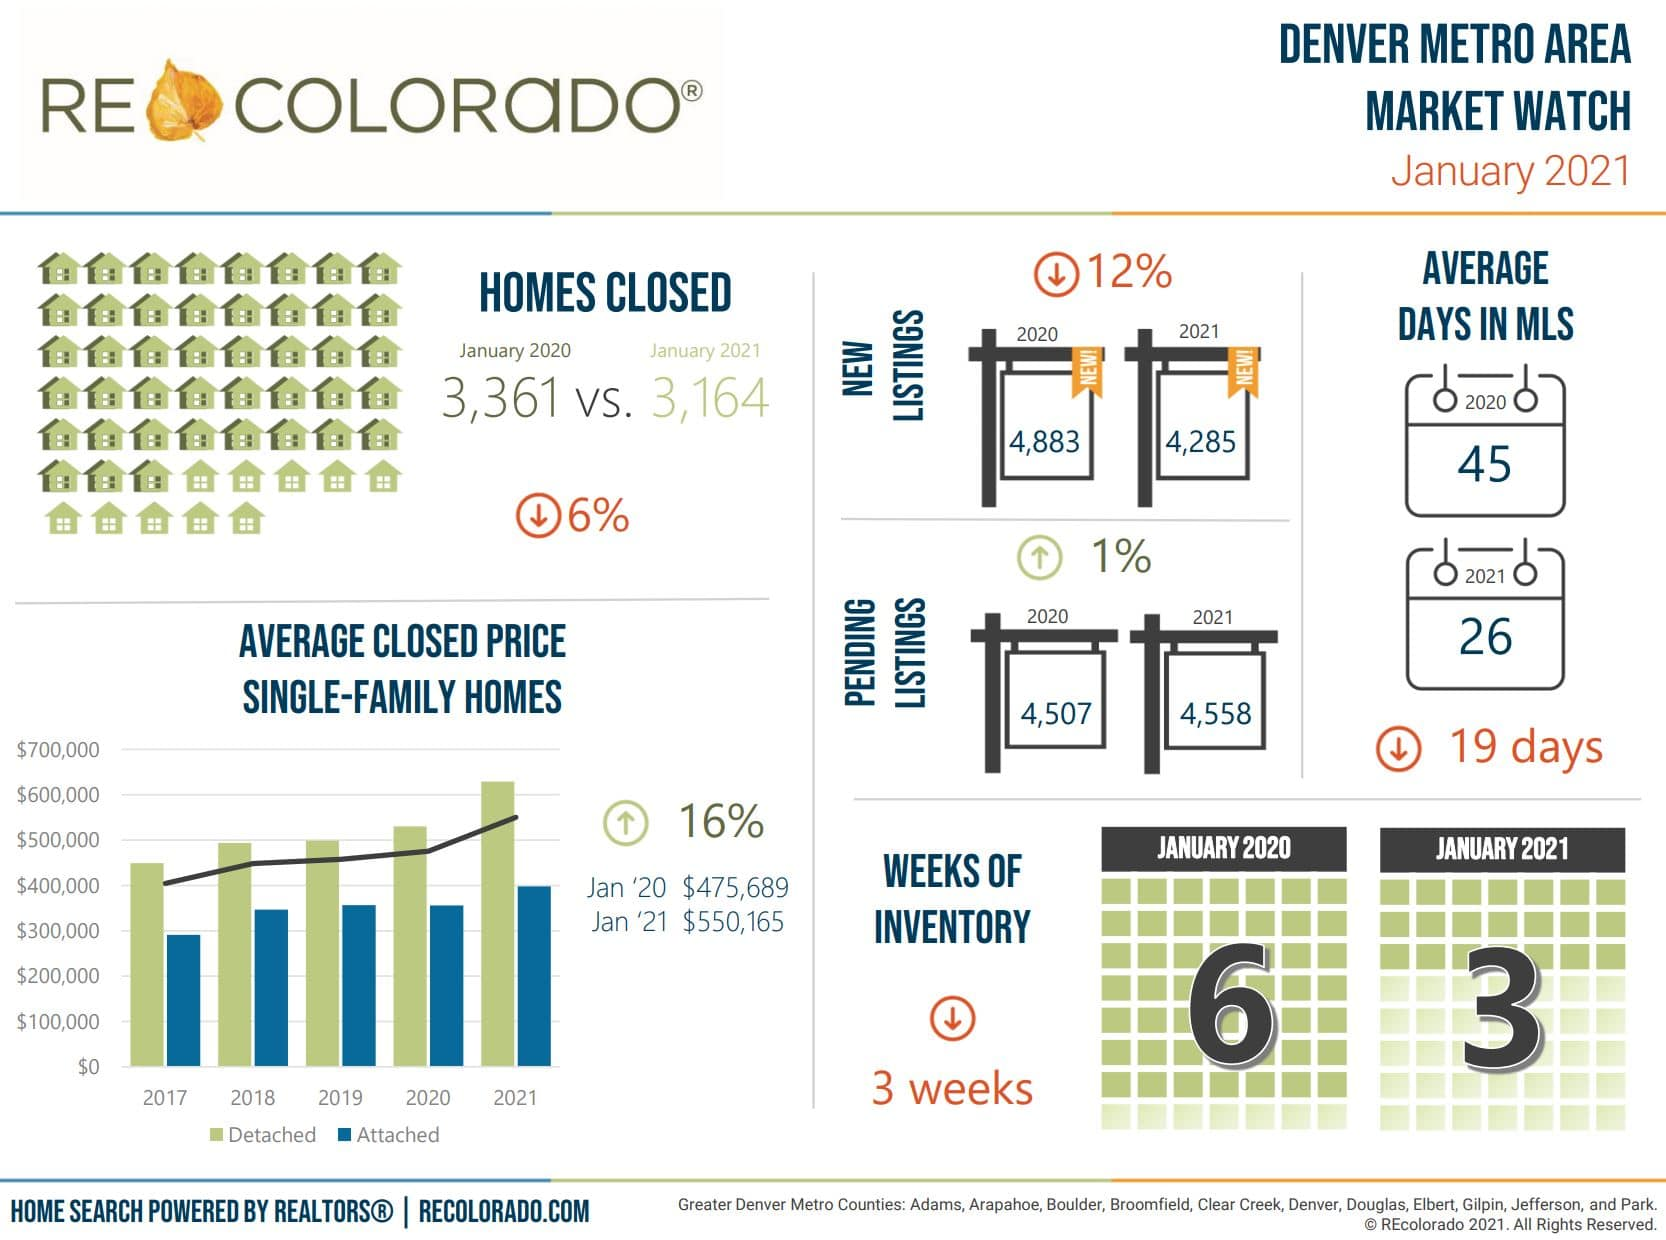 Denver Market Charts From REColorado